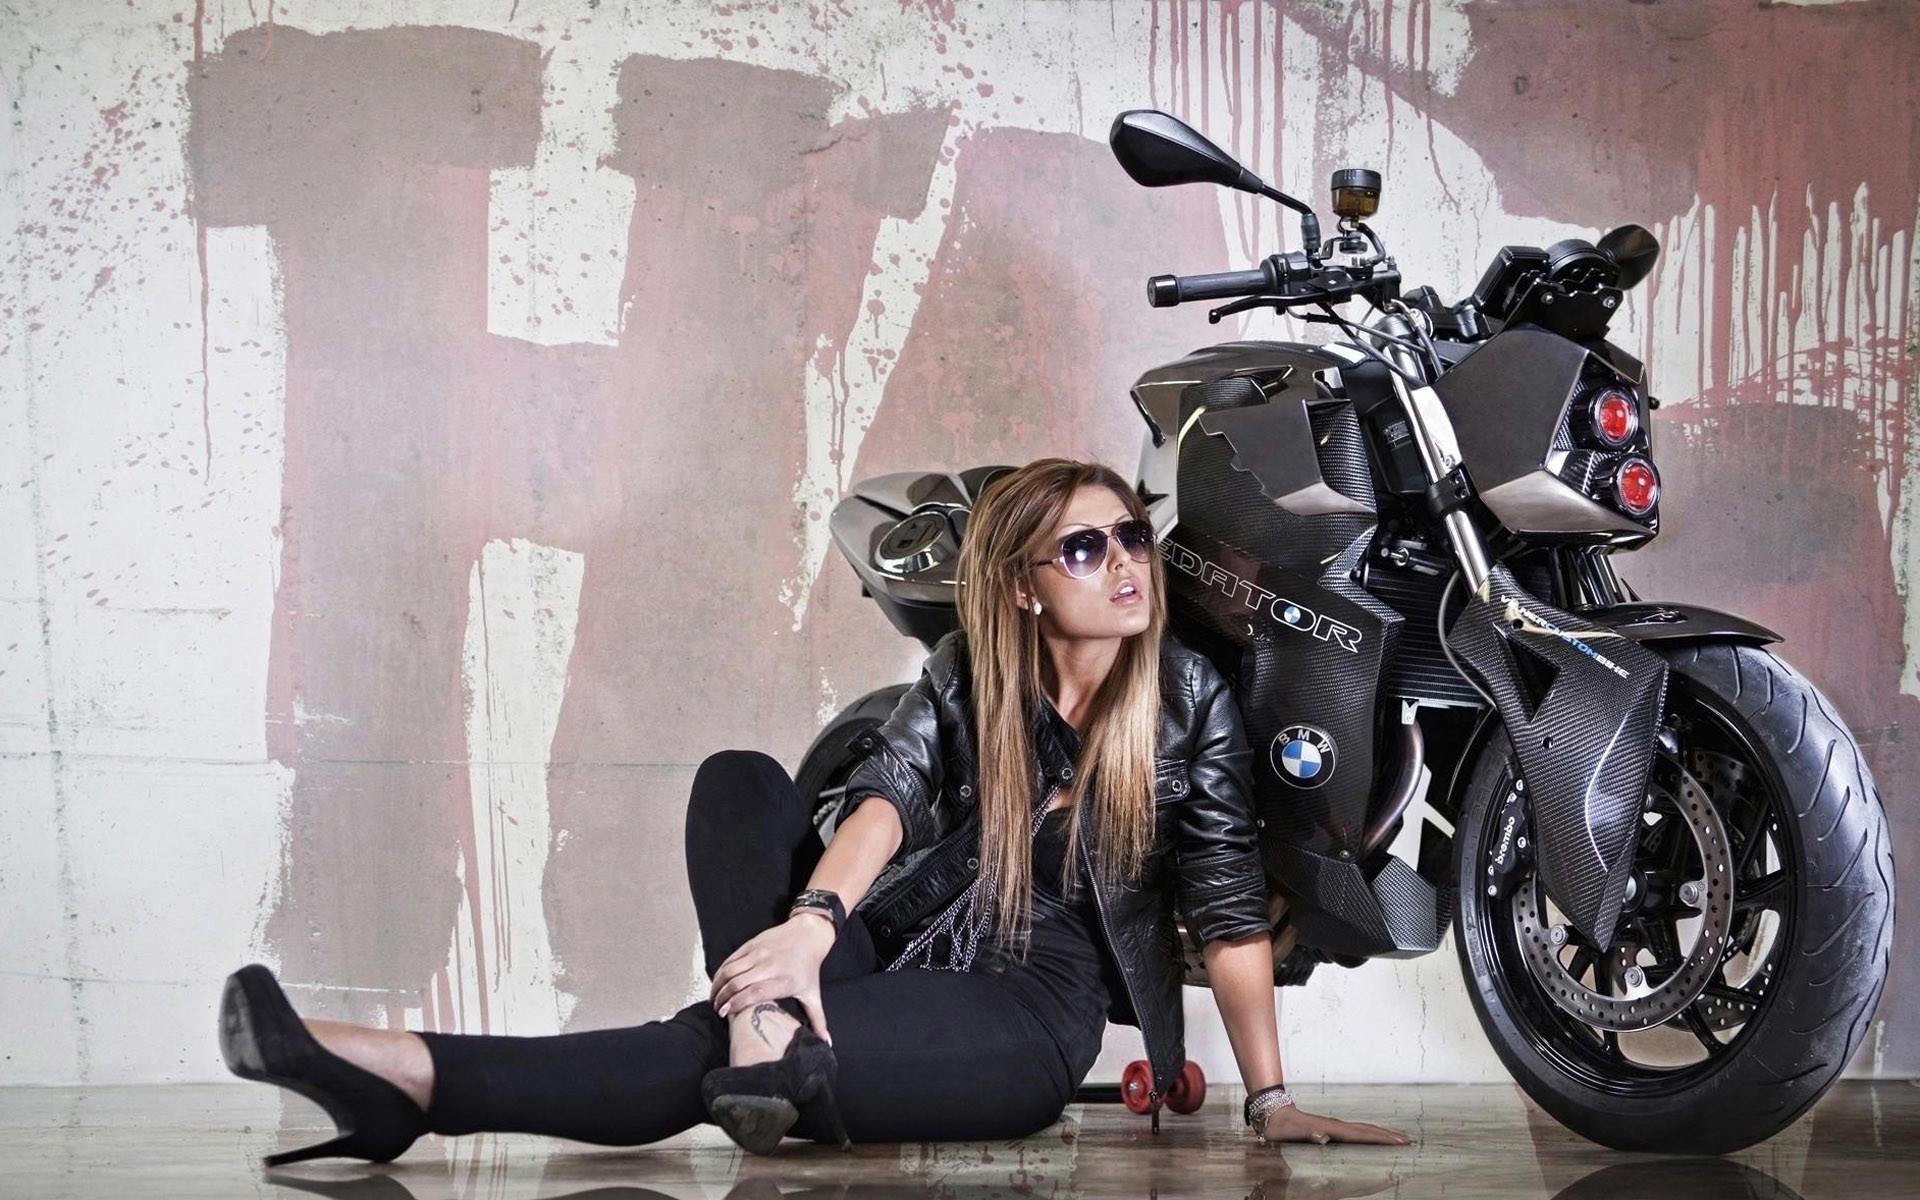 BMW F800R Girl Motorcycle HD Wallpaper